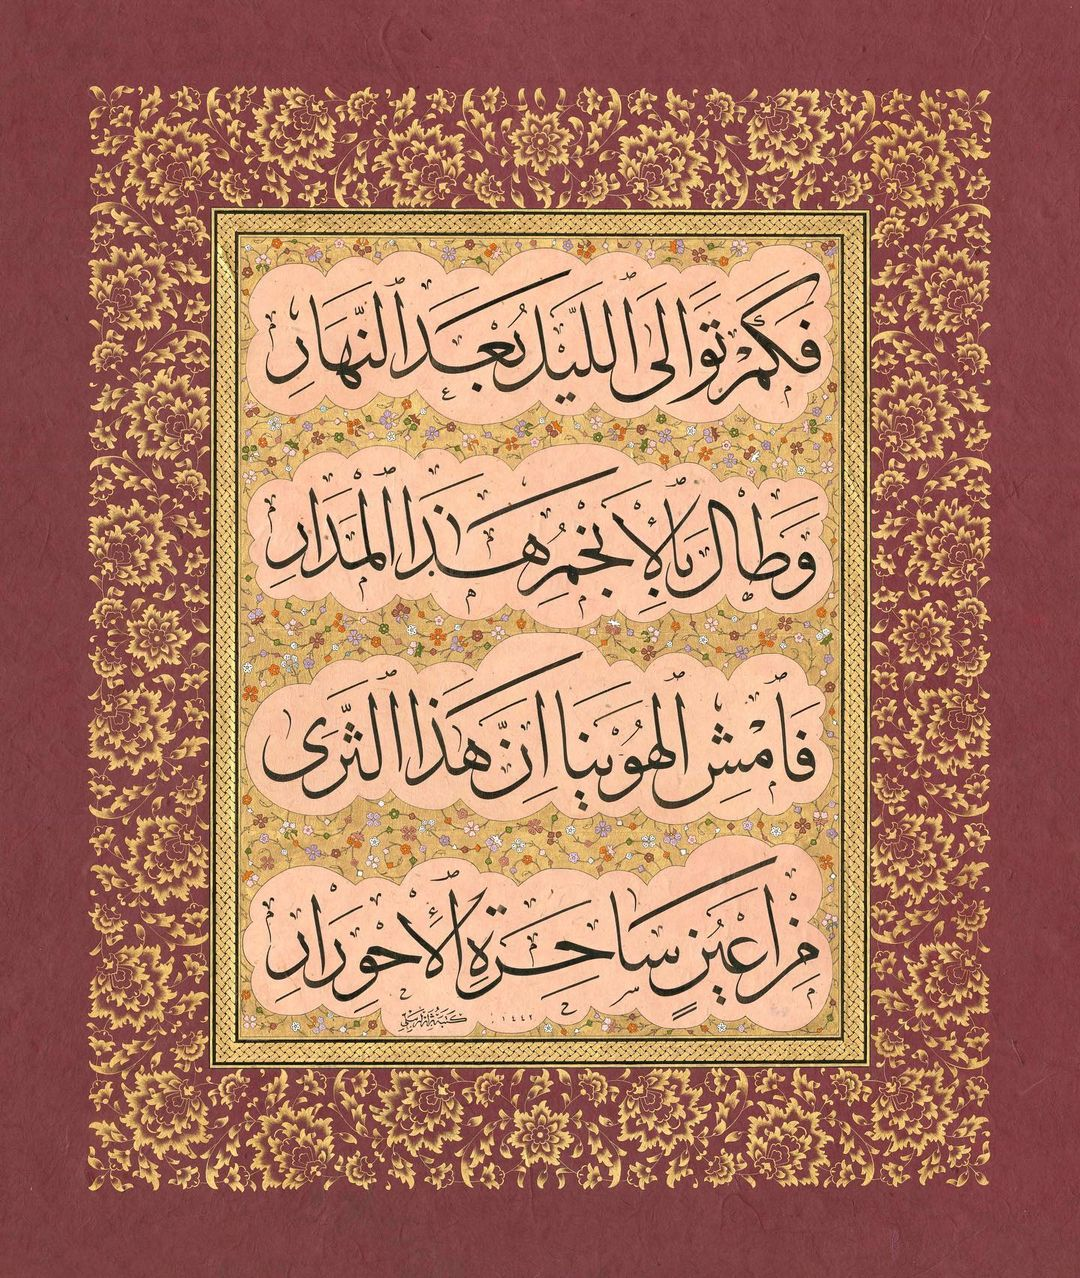 Professional Calligrapher Bijar Arbilly Calligraphy  الحكيم عمر الخيام في احدي رباعياته الجميلة .. بخط الثلث من تذهيب السيدة (Buse) #… 381